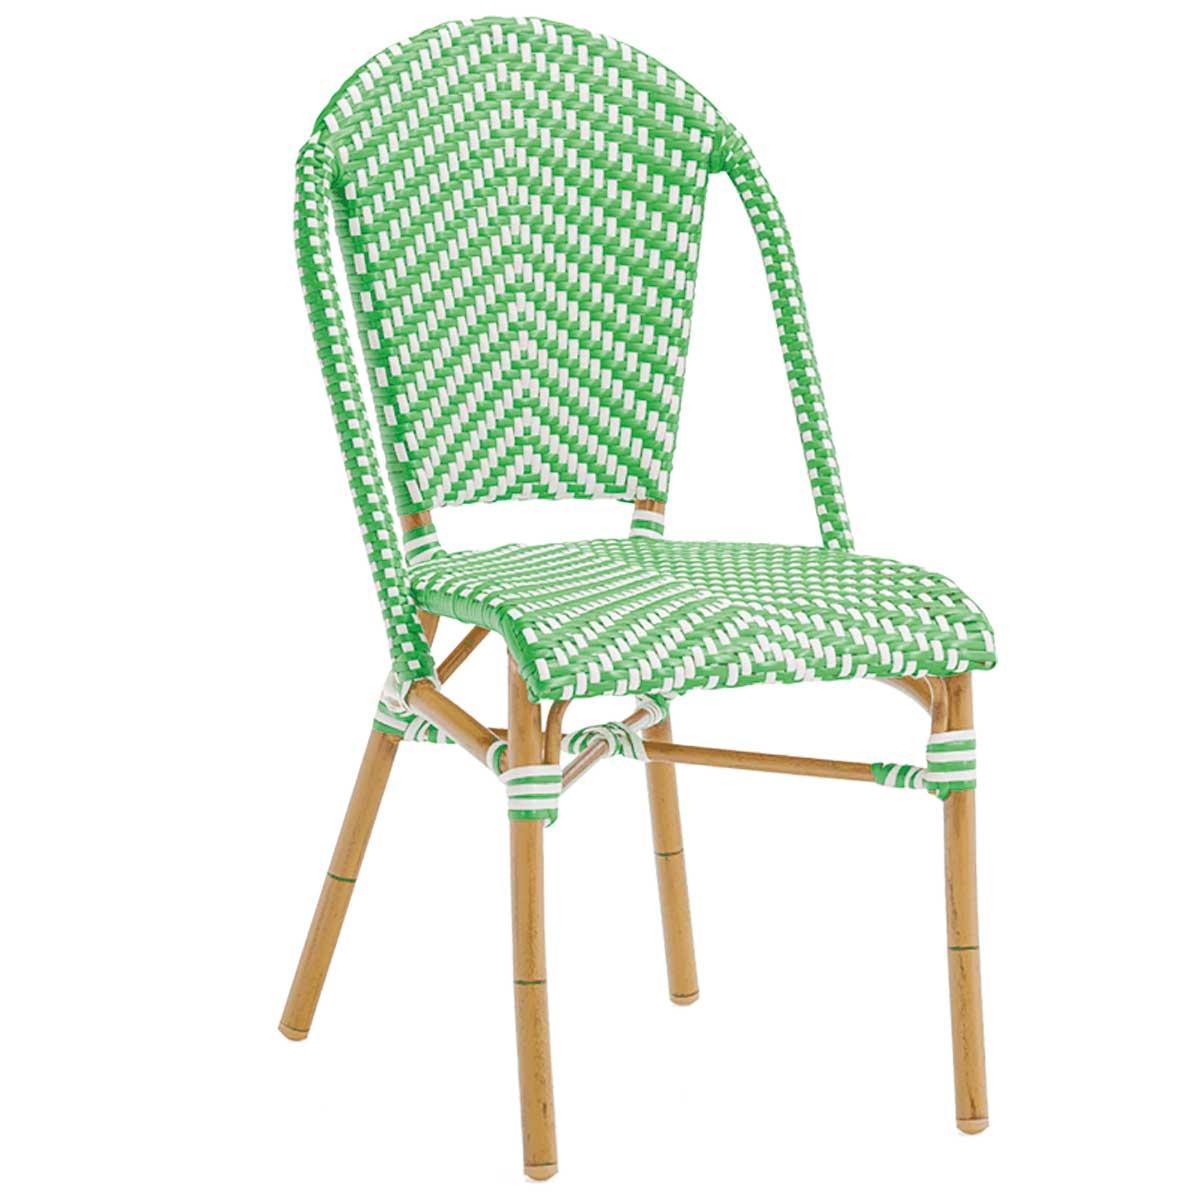 Montmartre c green 01 - https://www.werzalit.com/en/product/stuhl-montmartre/